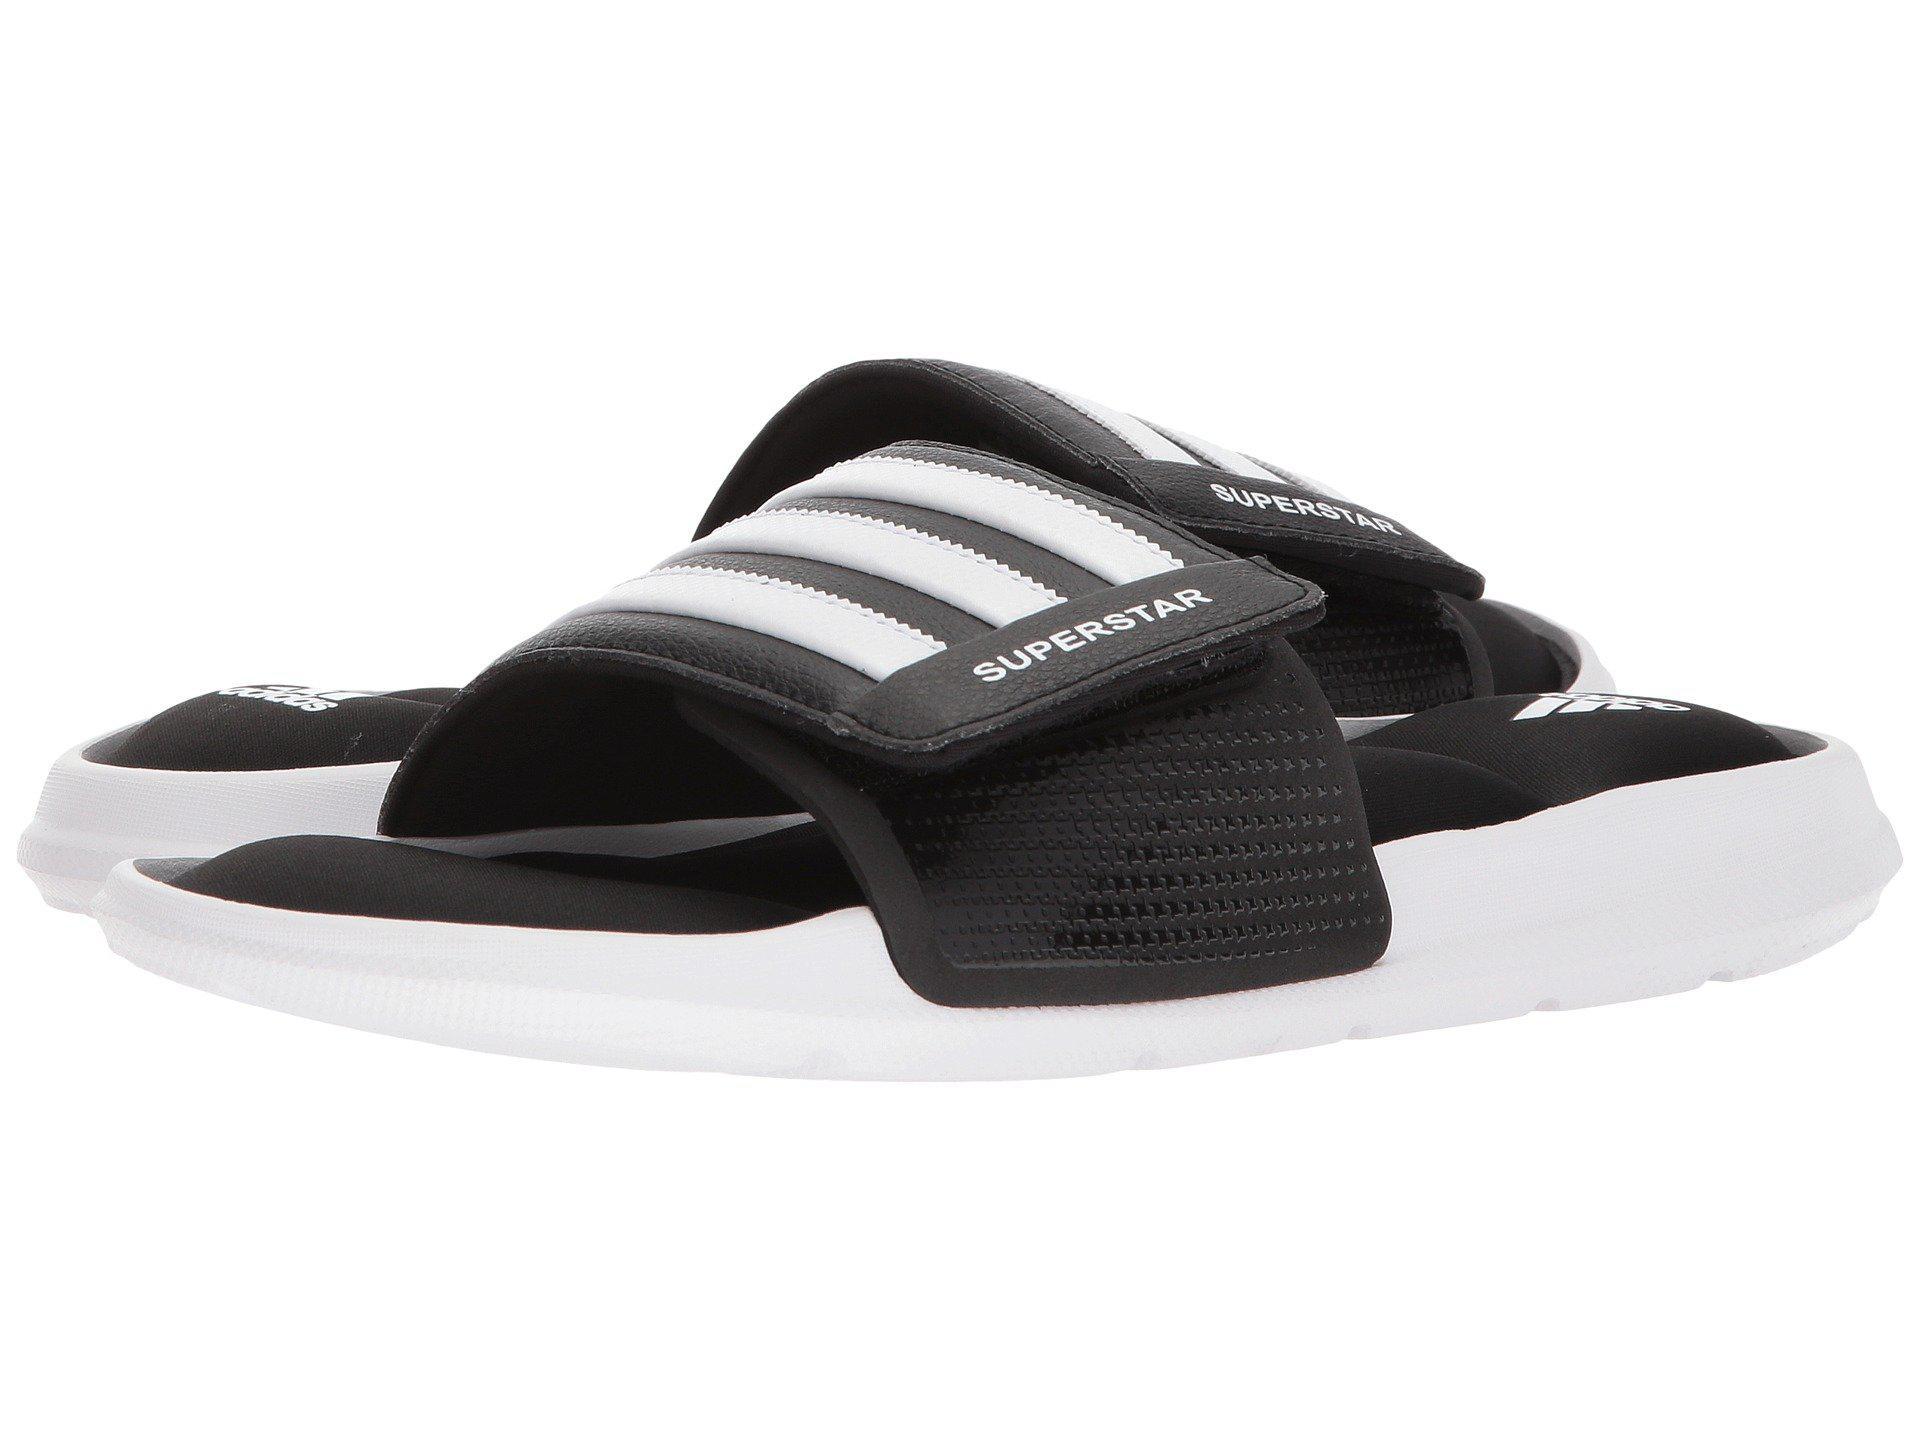 20f6f4baadcb4 Lyst - adidas Superstar 5g (black white black) Men s Slide Shoes in ...